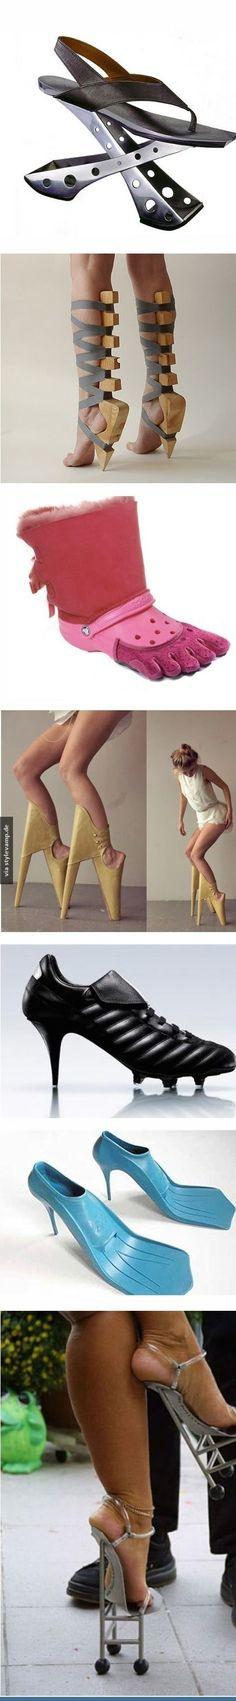 Katastrophale Schuhe!